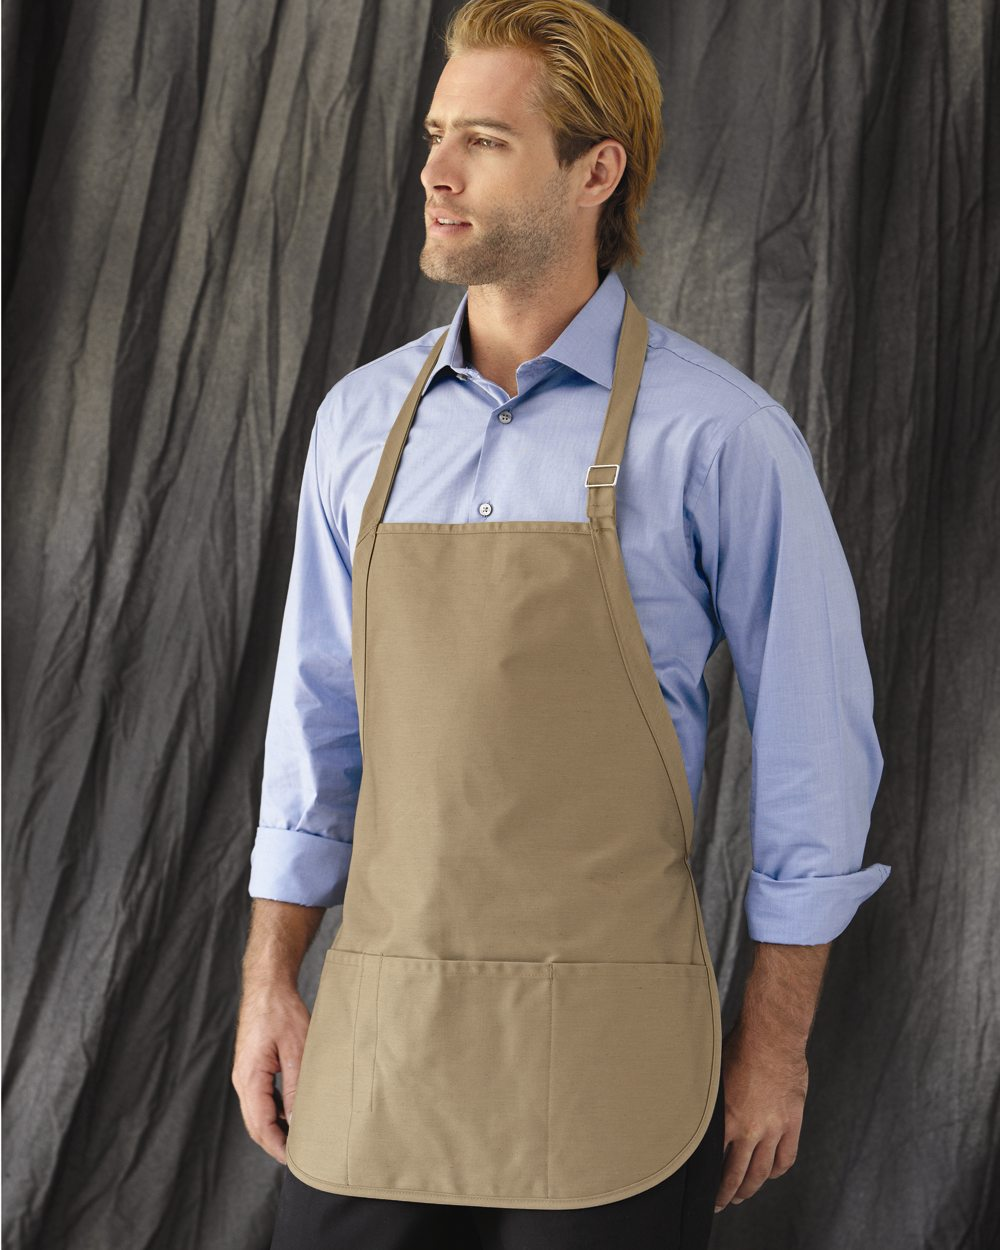 Liberty Bags 5507-Adjustable Neck Strap Three Pocket Apron